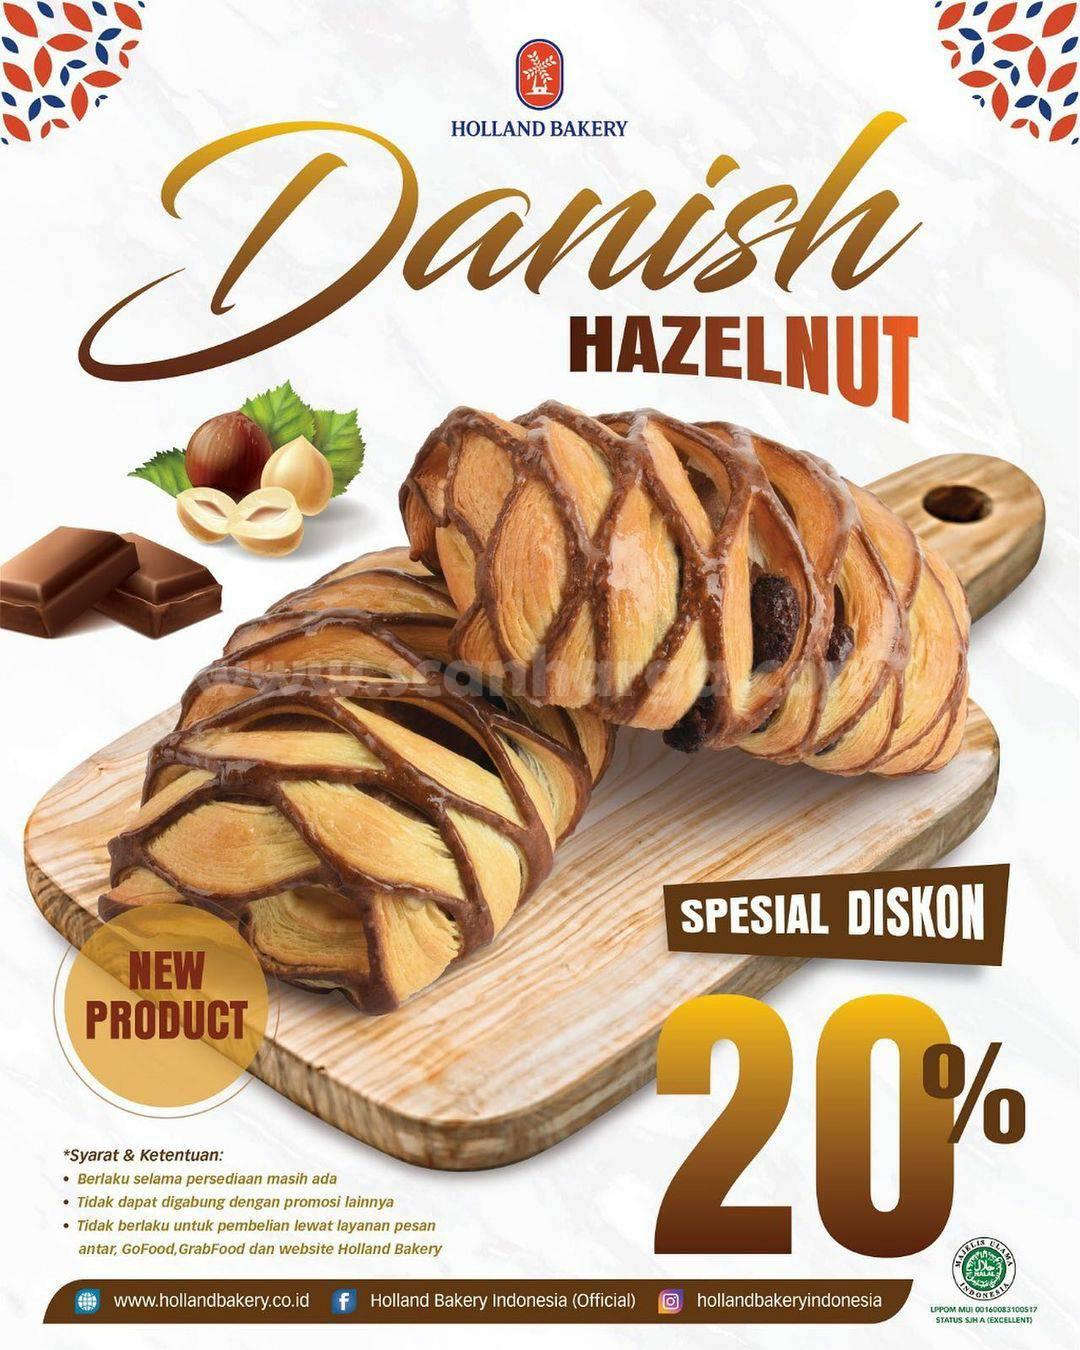 Promo Holland Bakery Menu Baru! Danish Hazelnut Spesial Diskon 20%